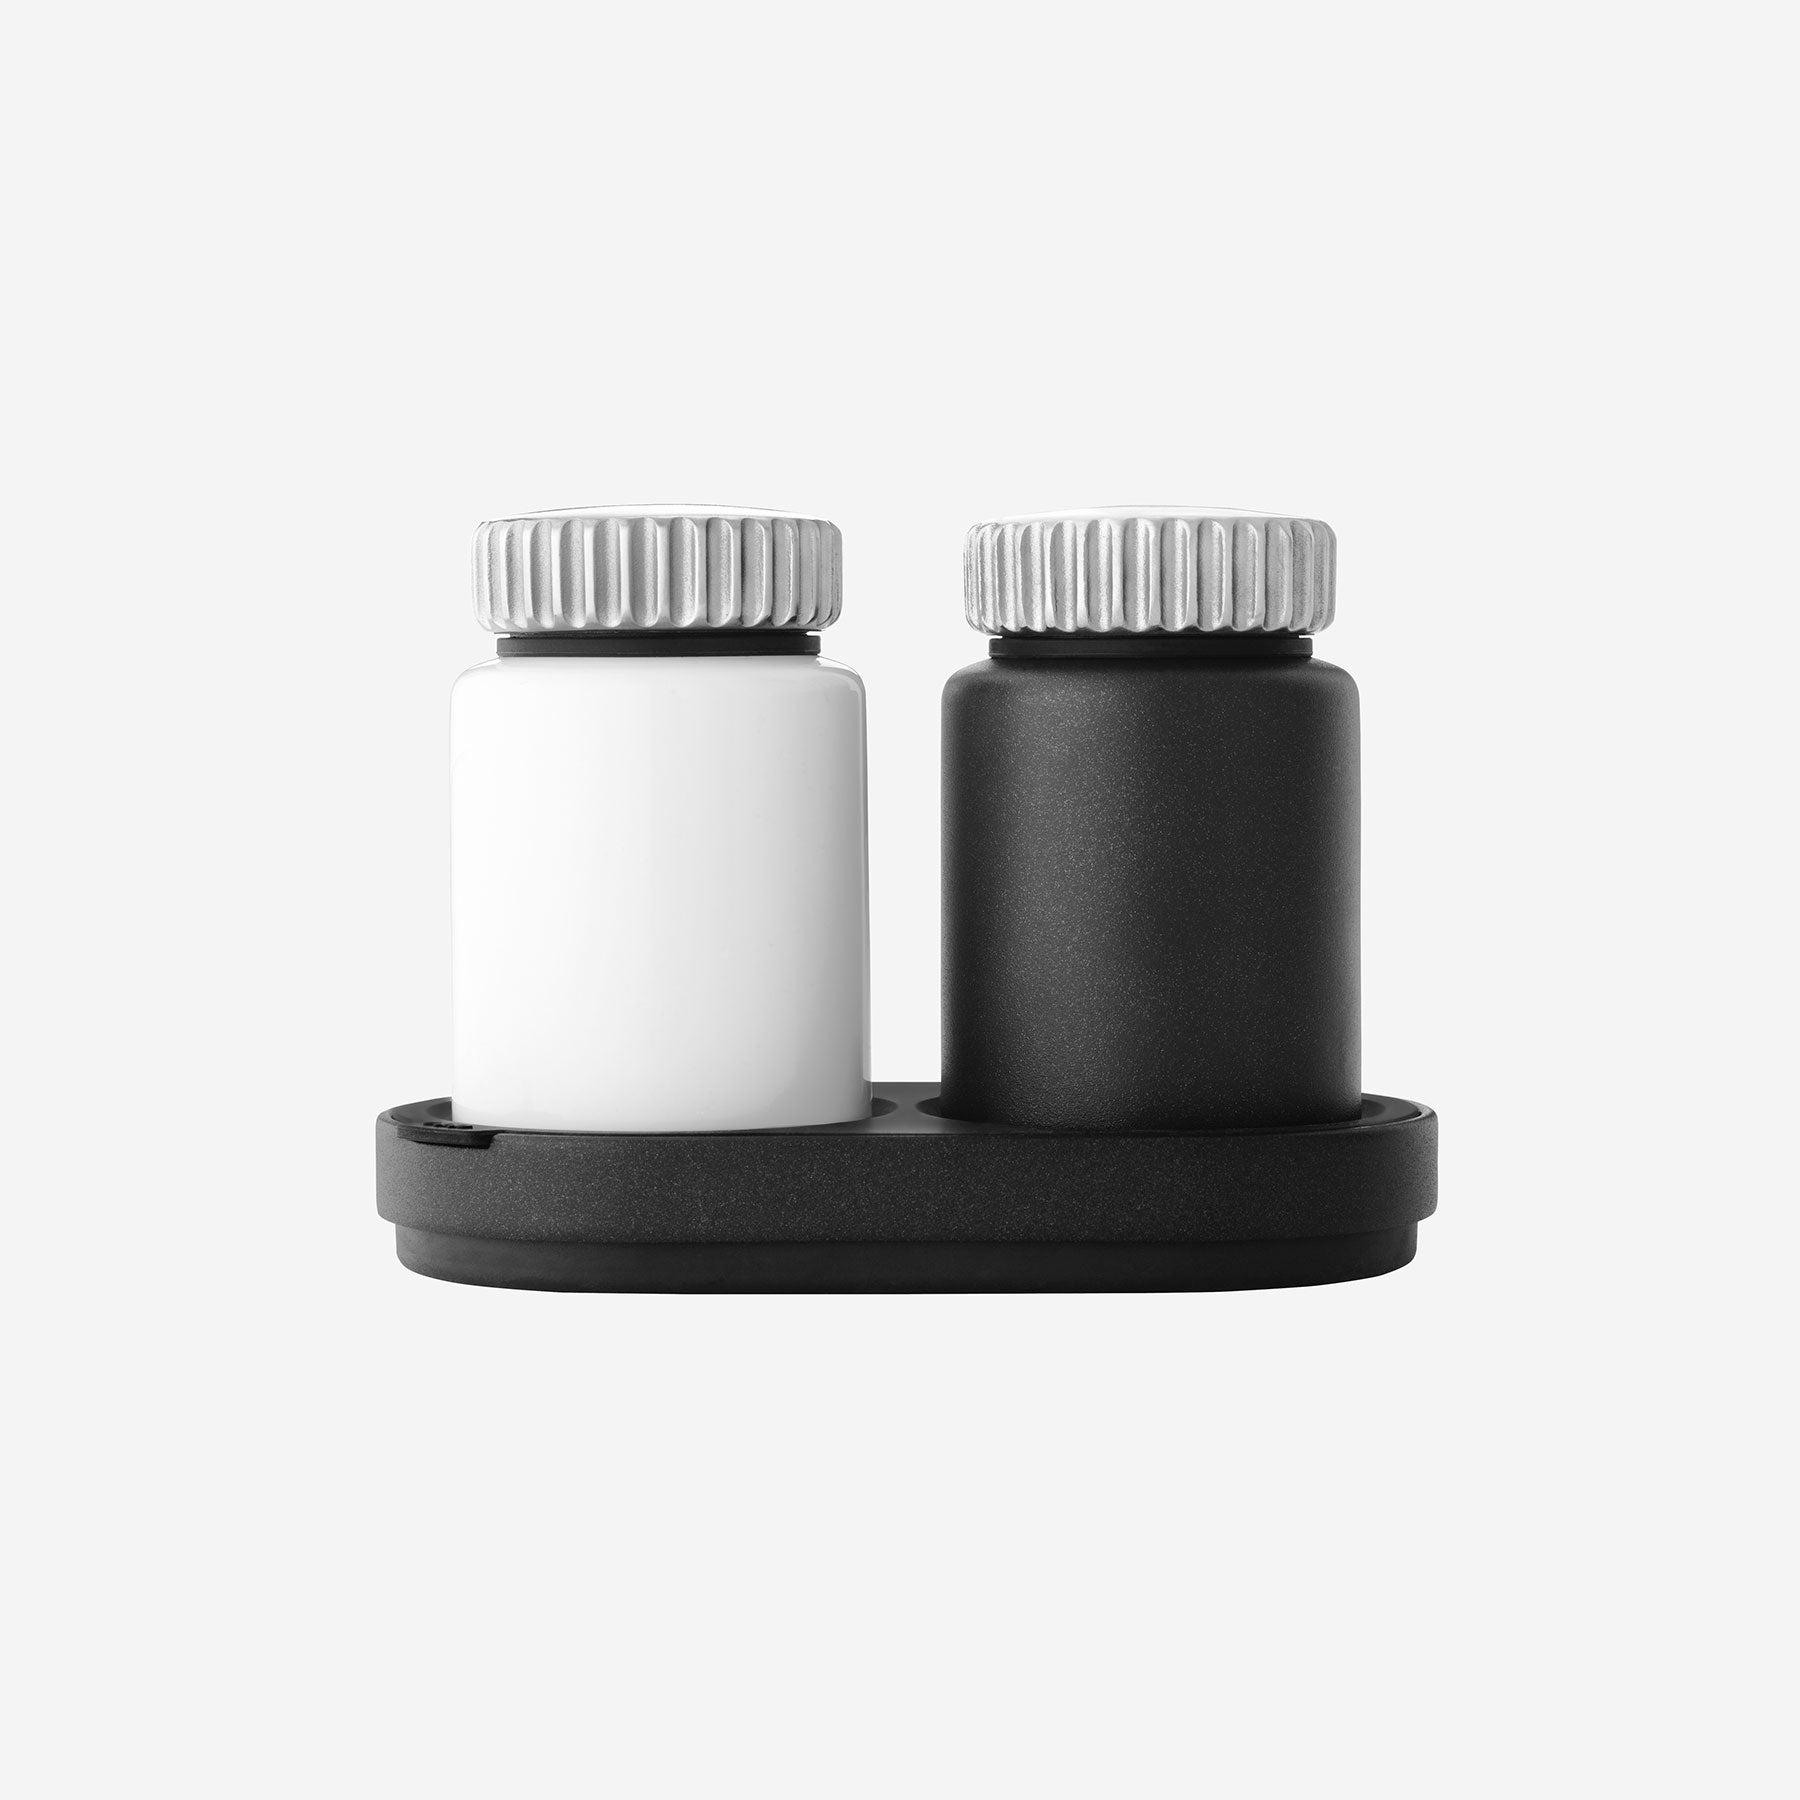 vipp-263-salt-pepper-1 (1)